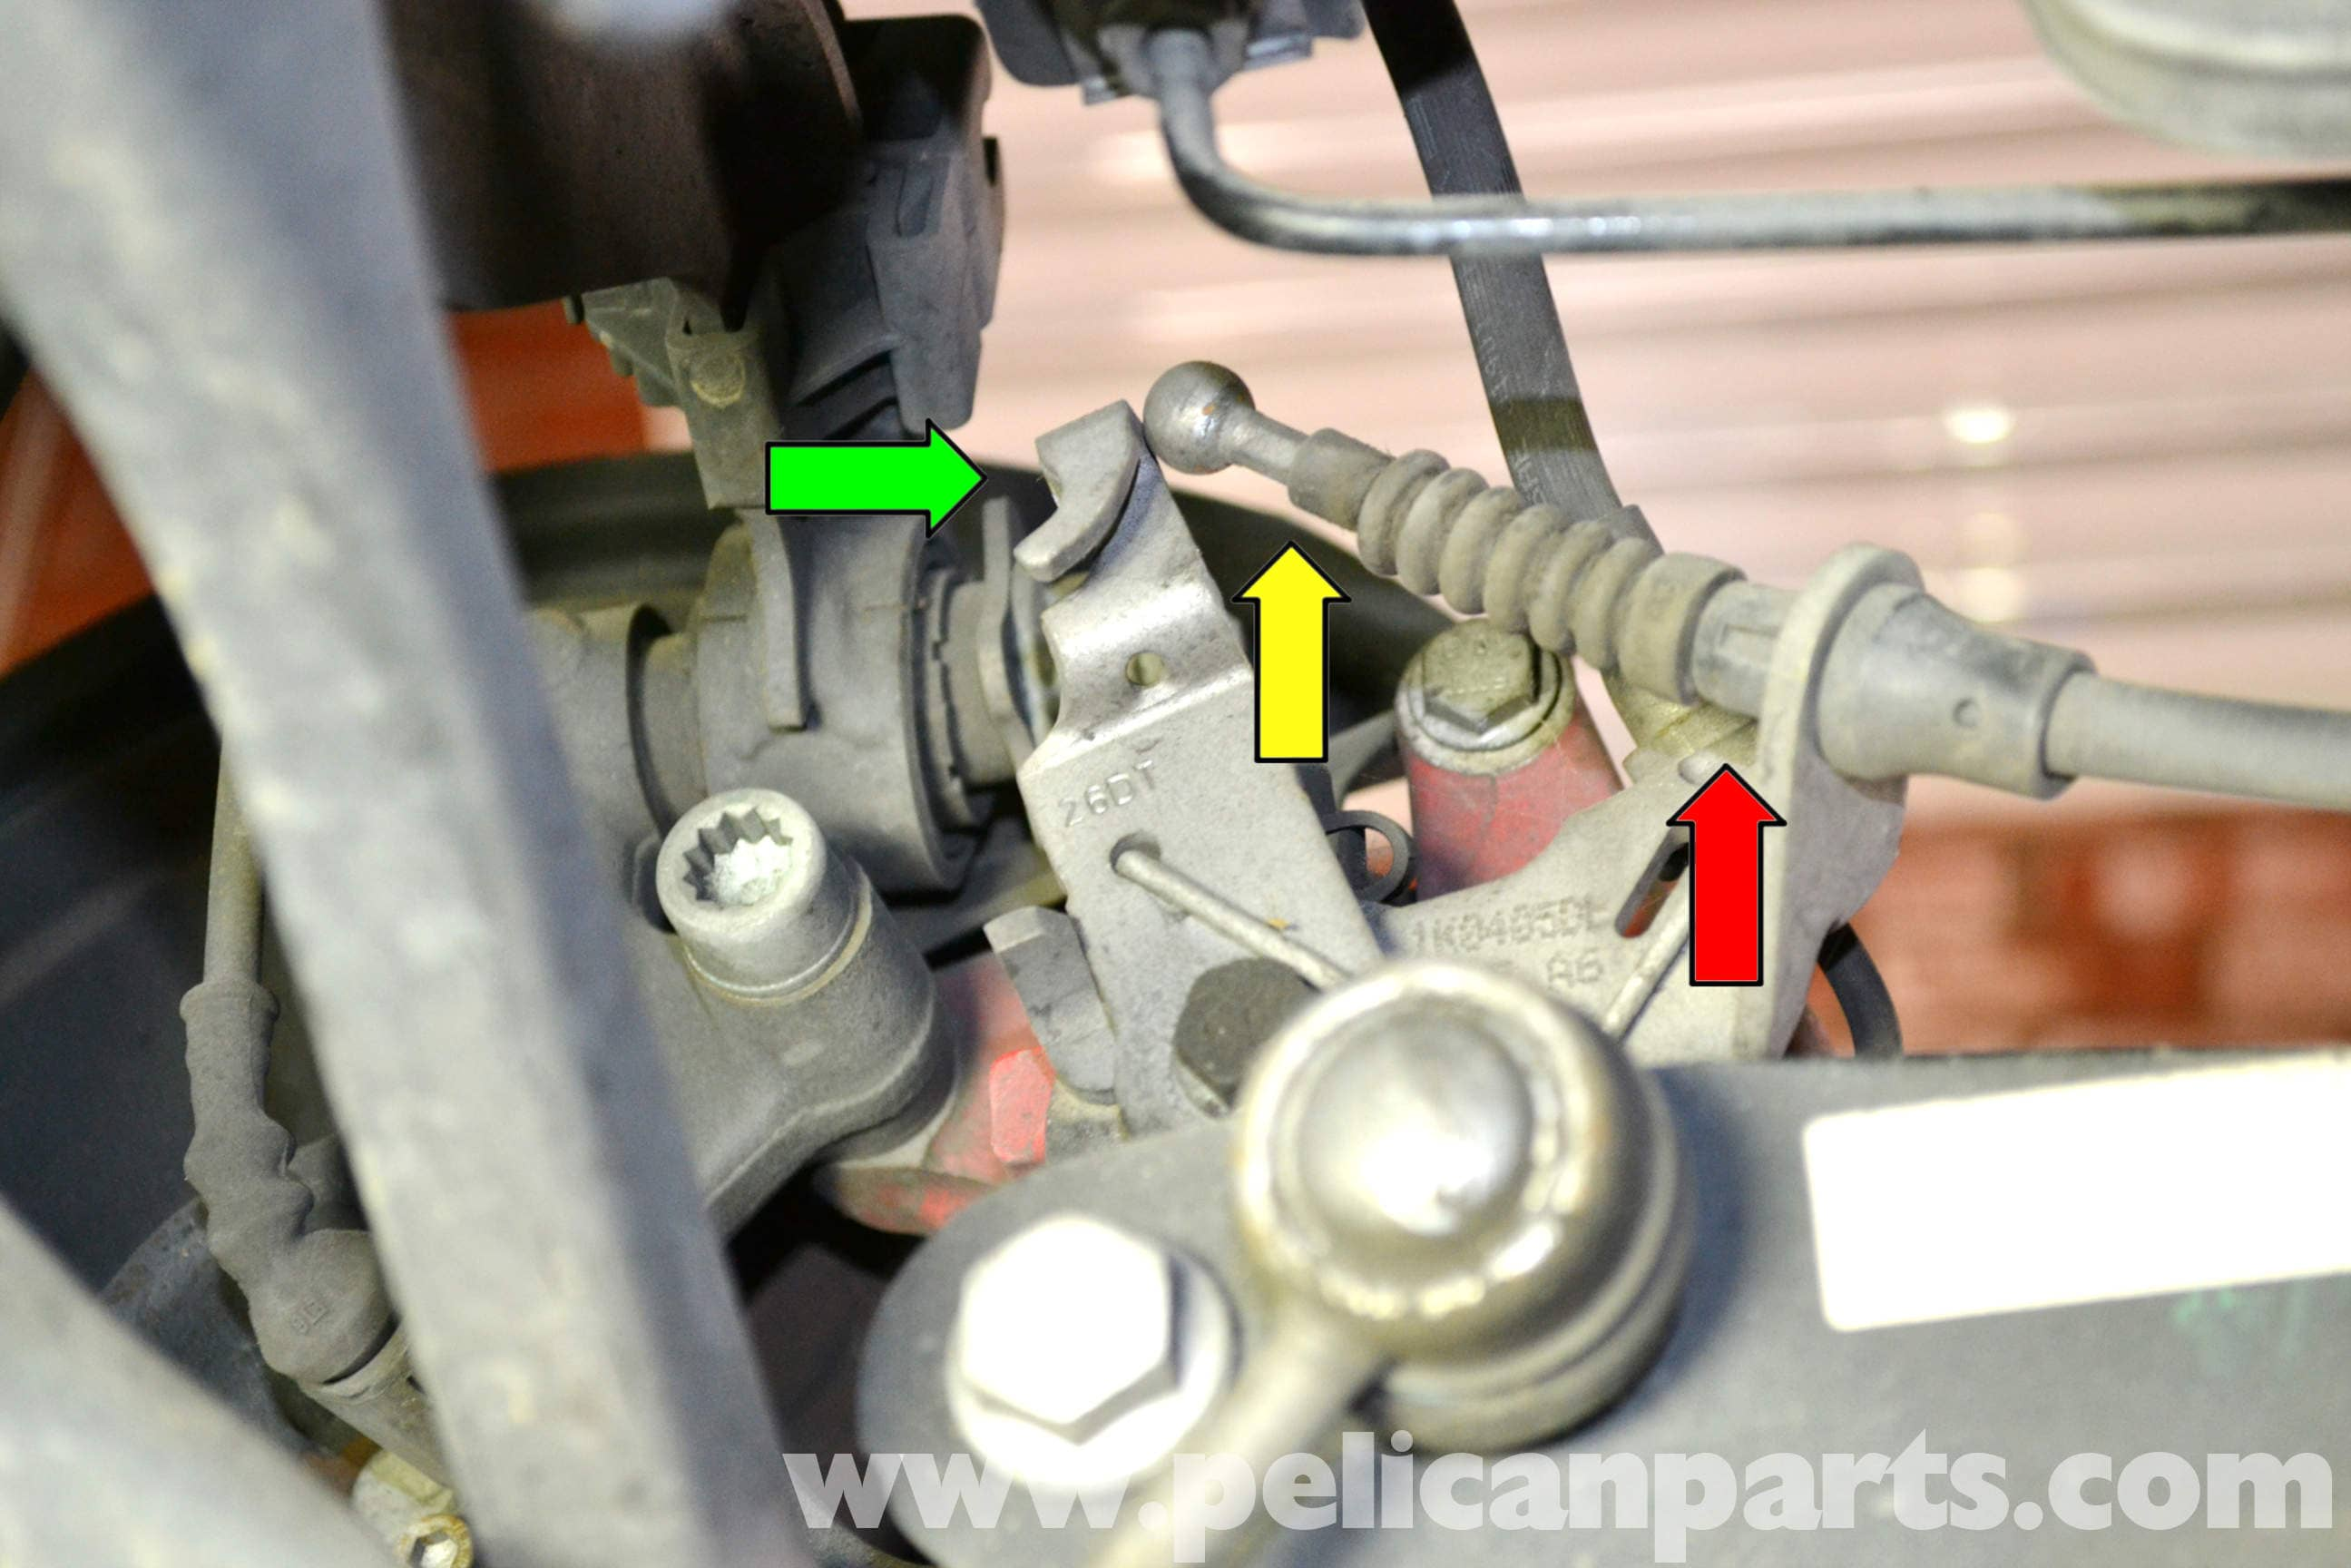 Electrical Wiring Diagram Moreover 2015 Vw Golf Gti 4 Door On 2004